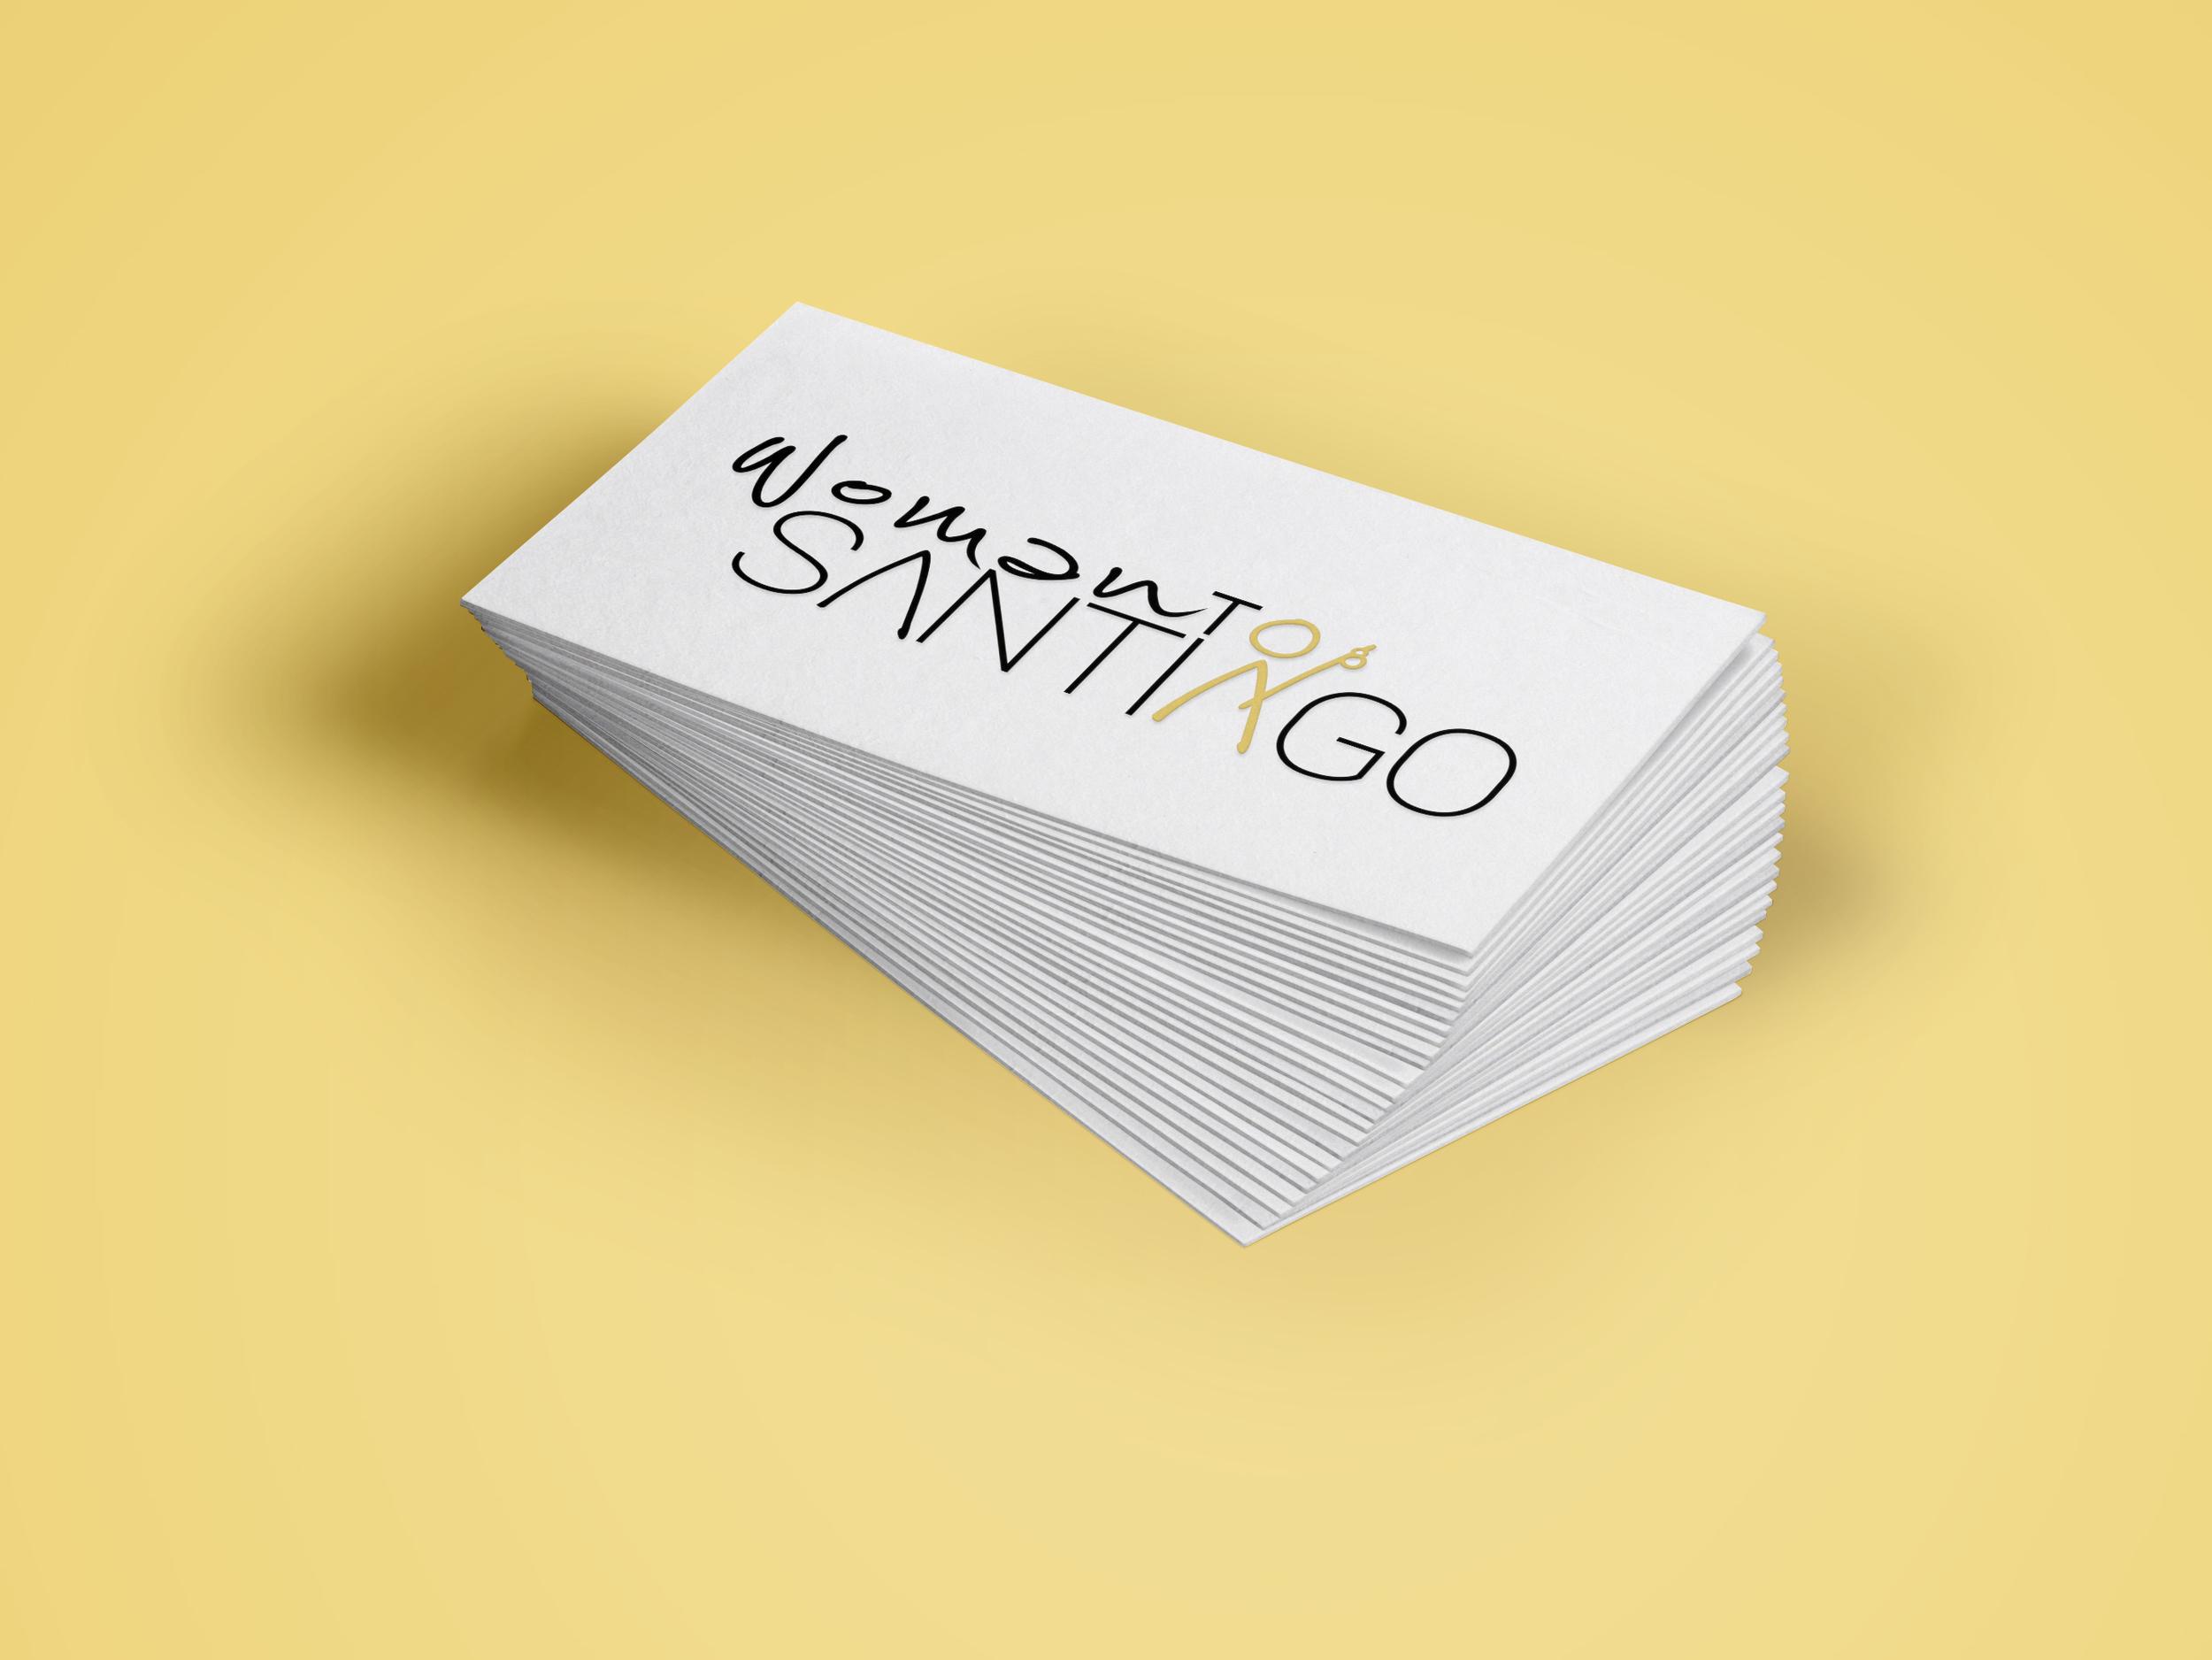 Business-card-mockup-vol-26.jpg